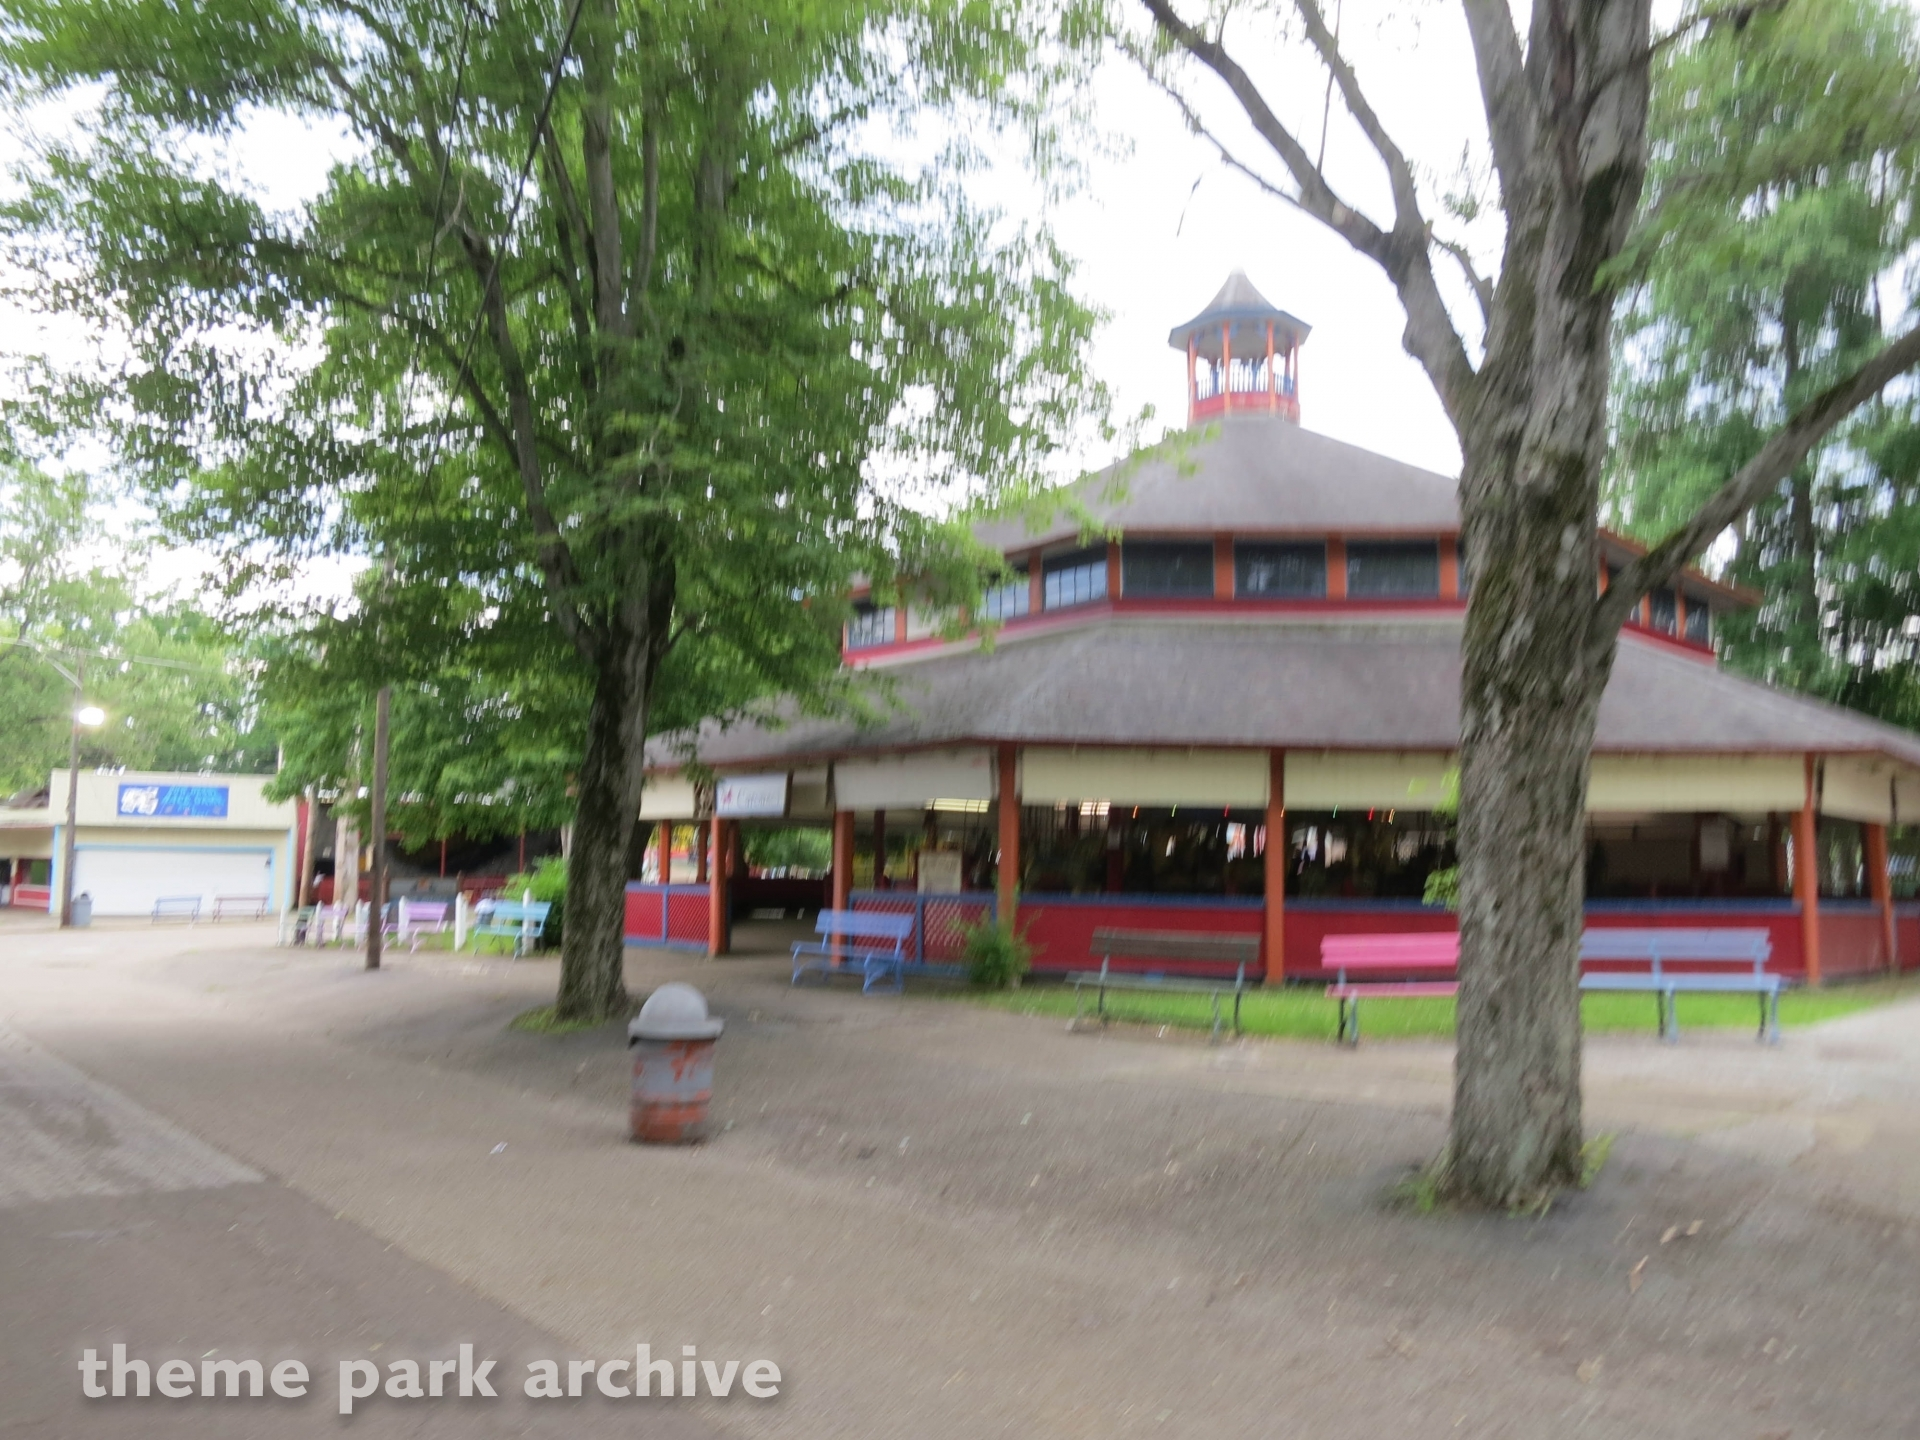 Carousel at Conneaut Lake Park